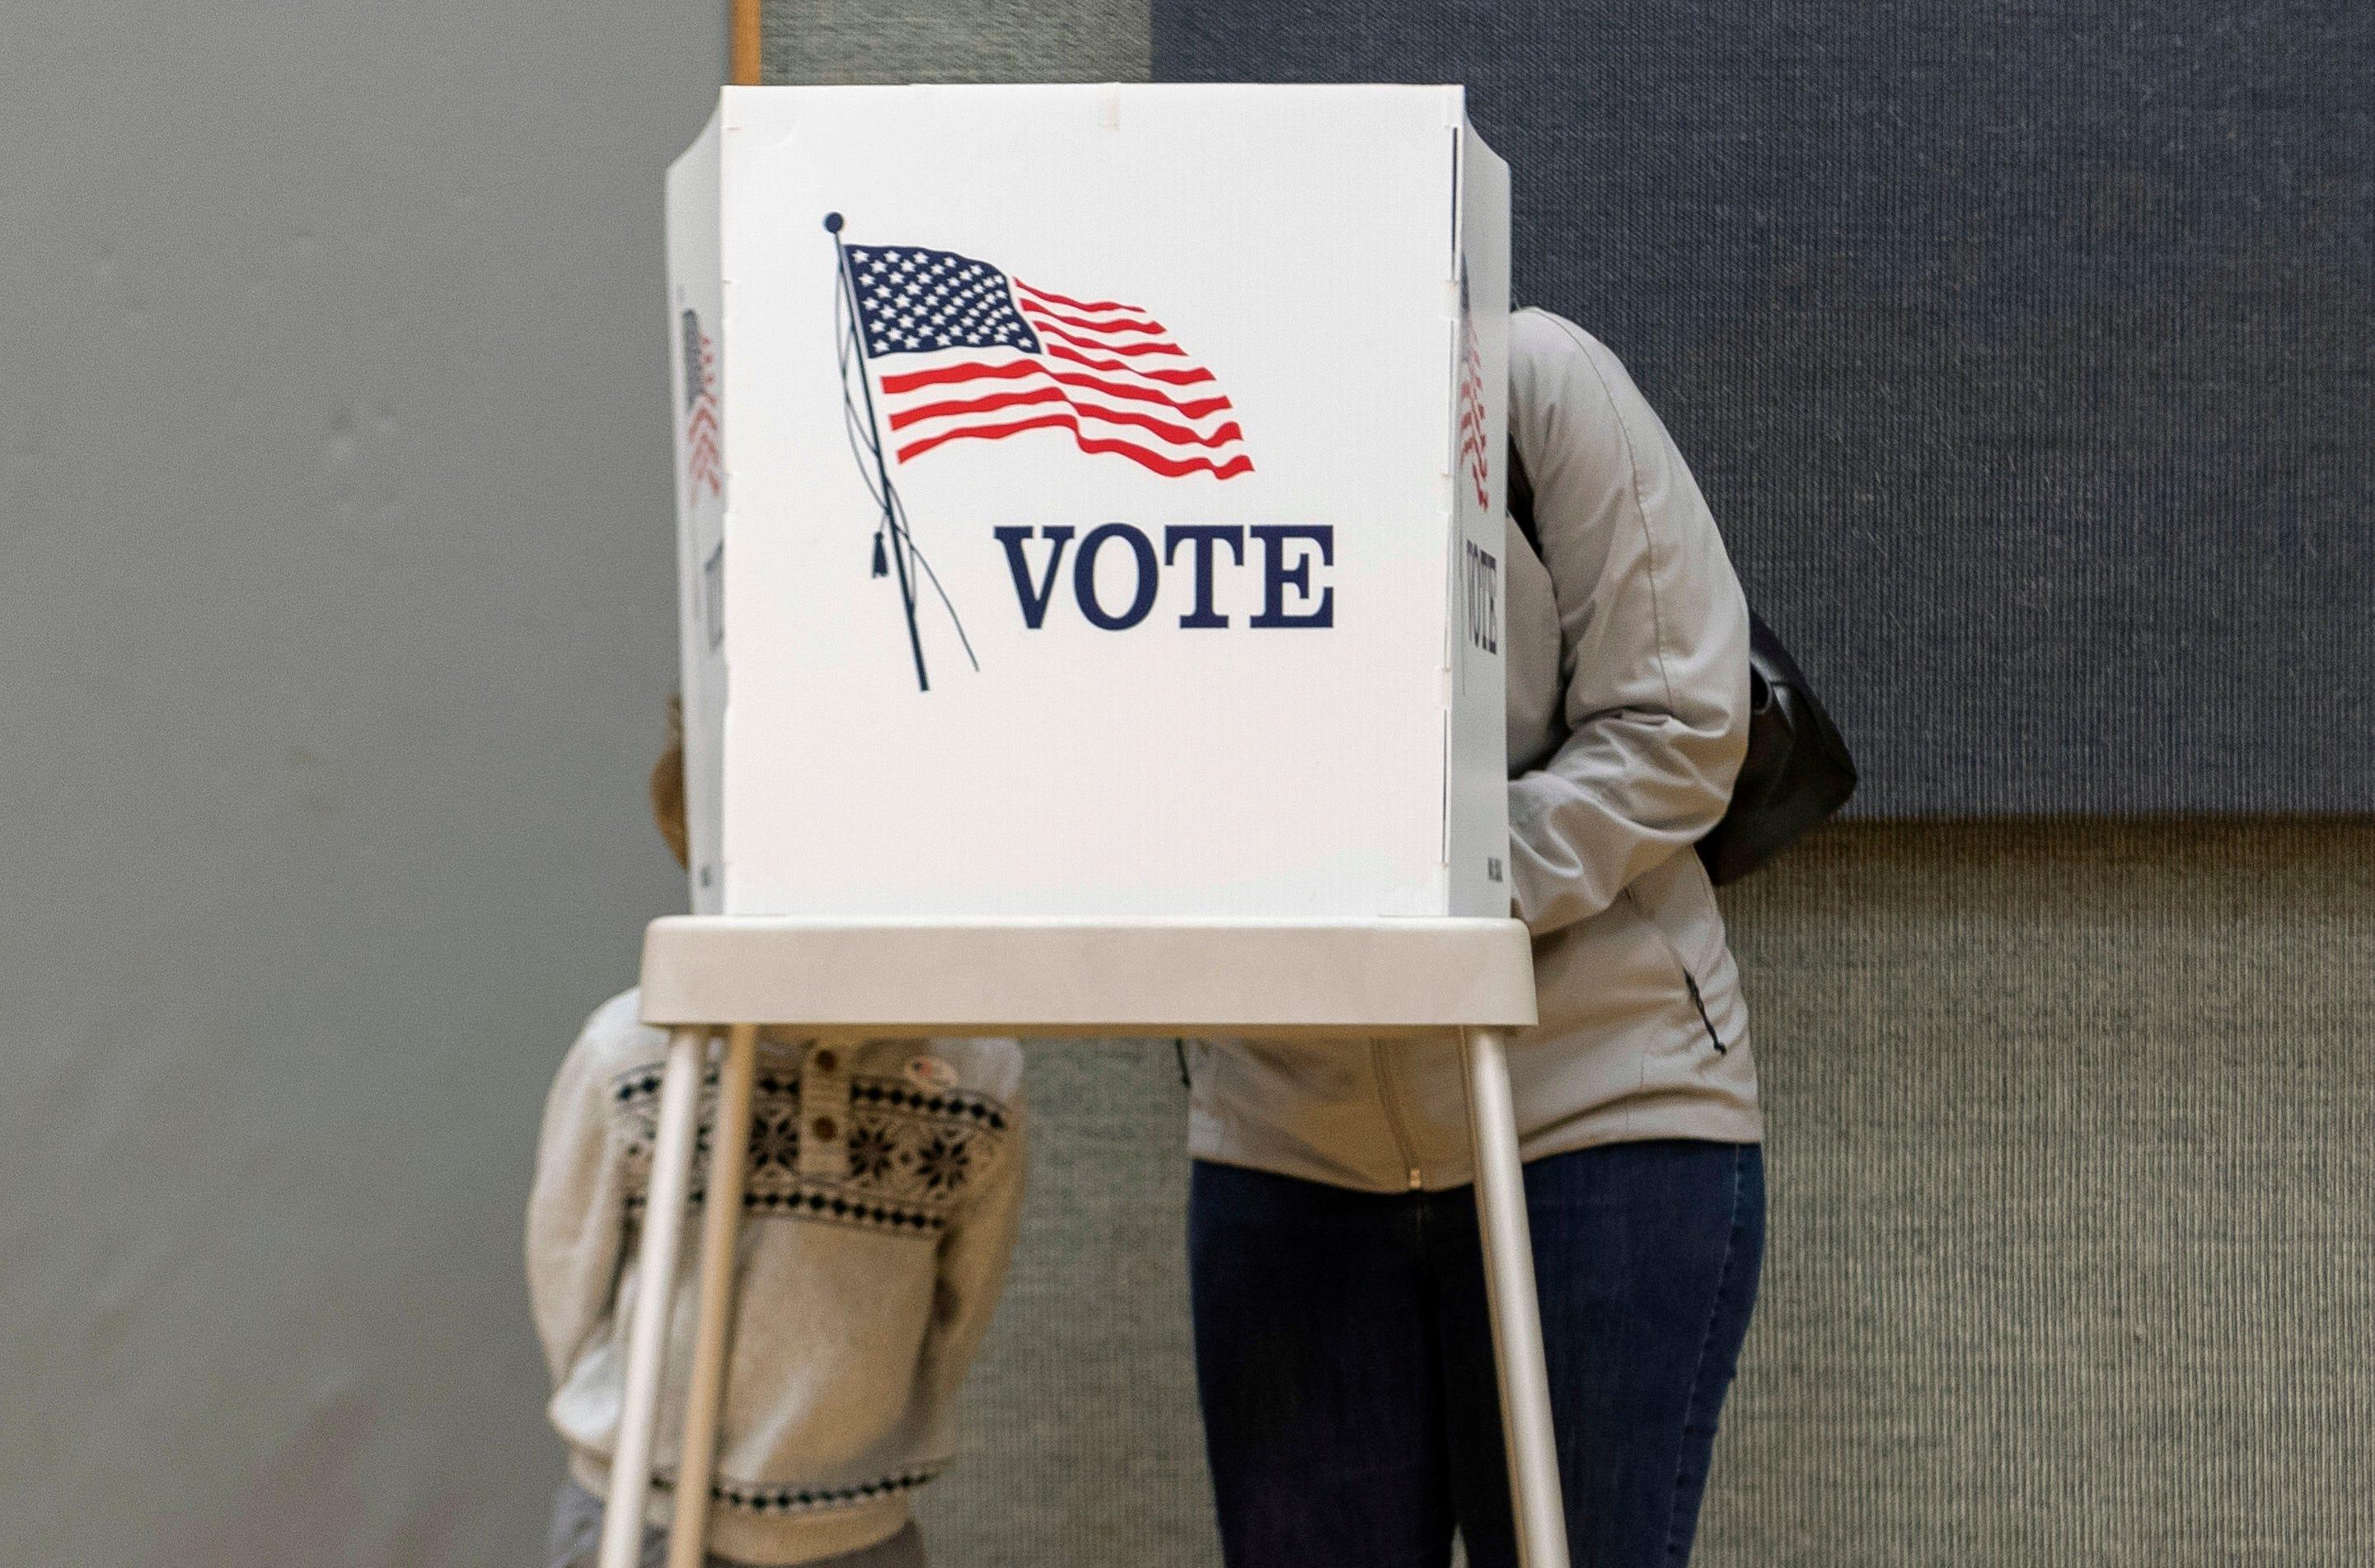 Ap 2018 Election House Kentucky Mcgrath A Eln Usa Ky